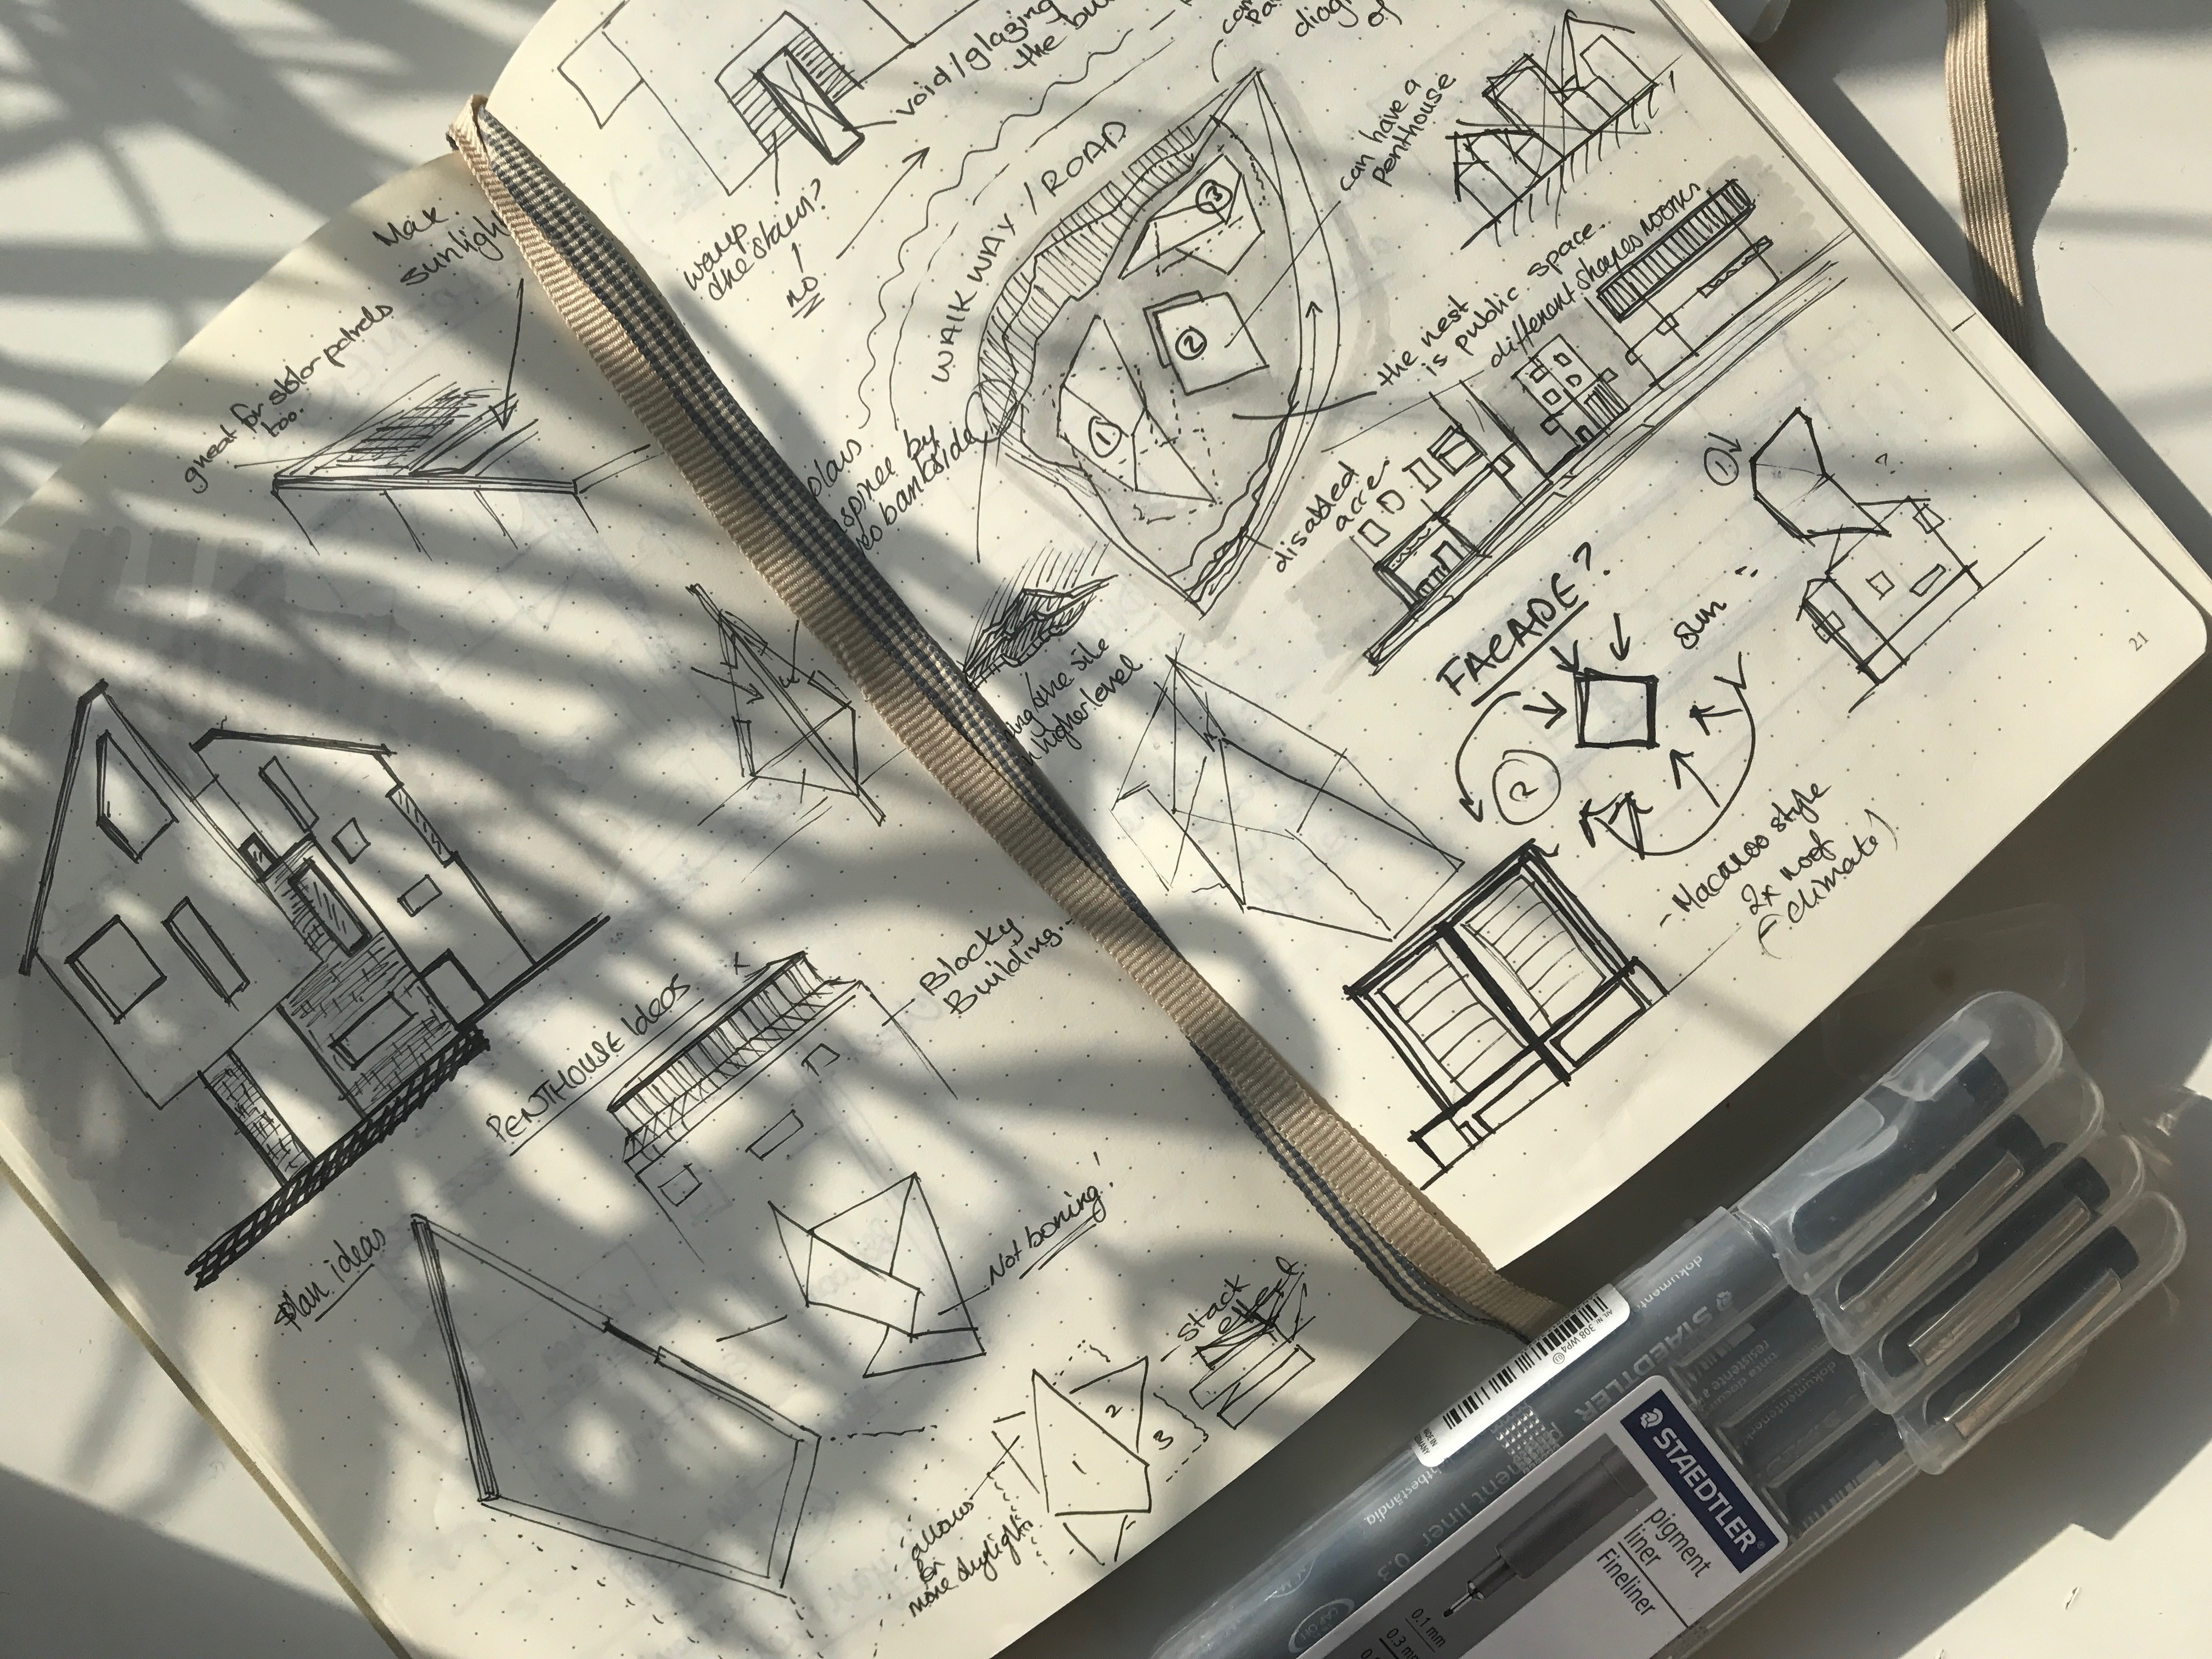 Design process of a KSA architecture student